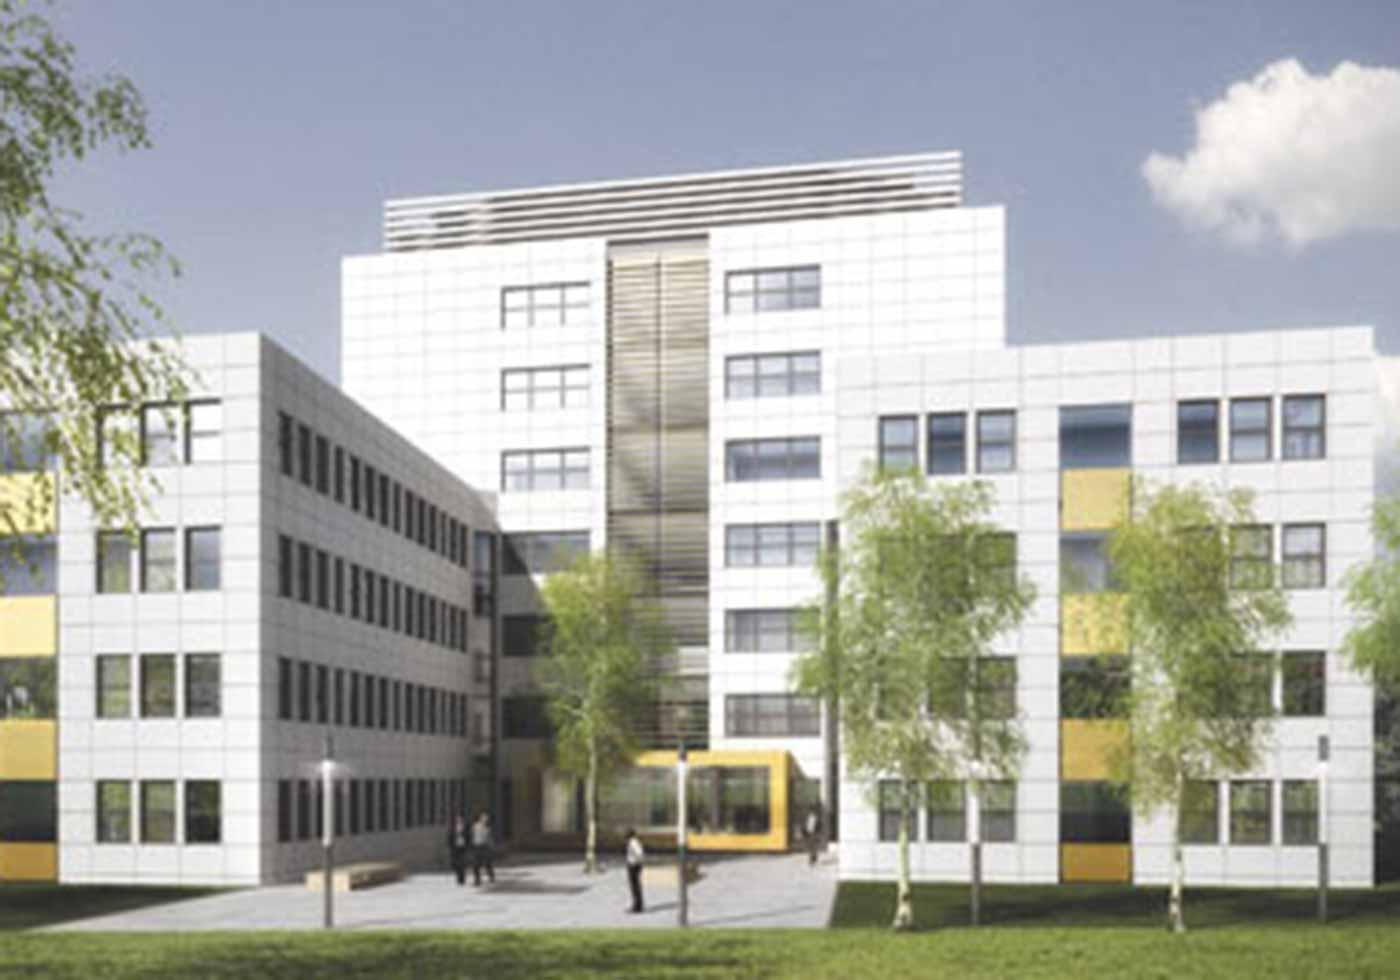 Bürostadt Niederrad, Frankfurt am Main, DE